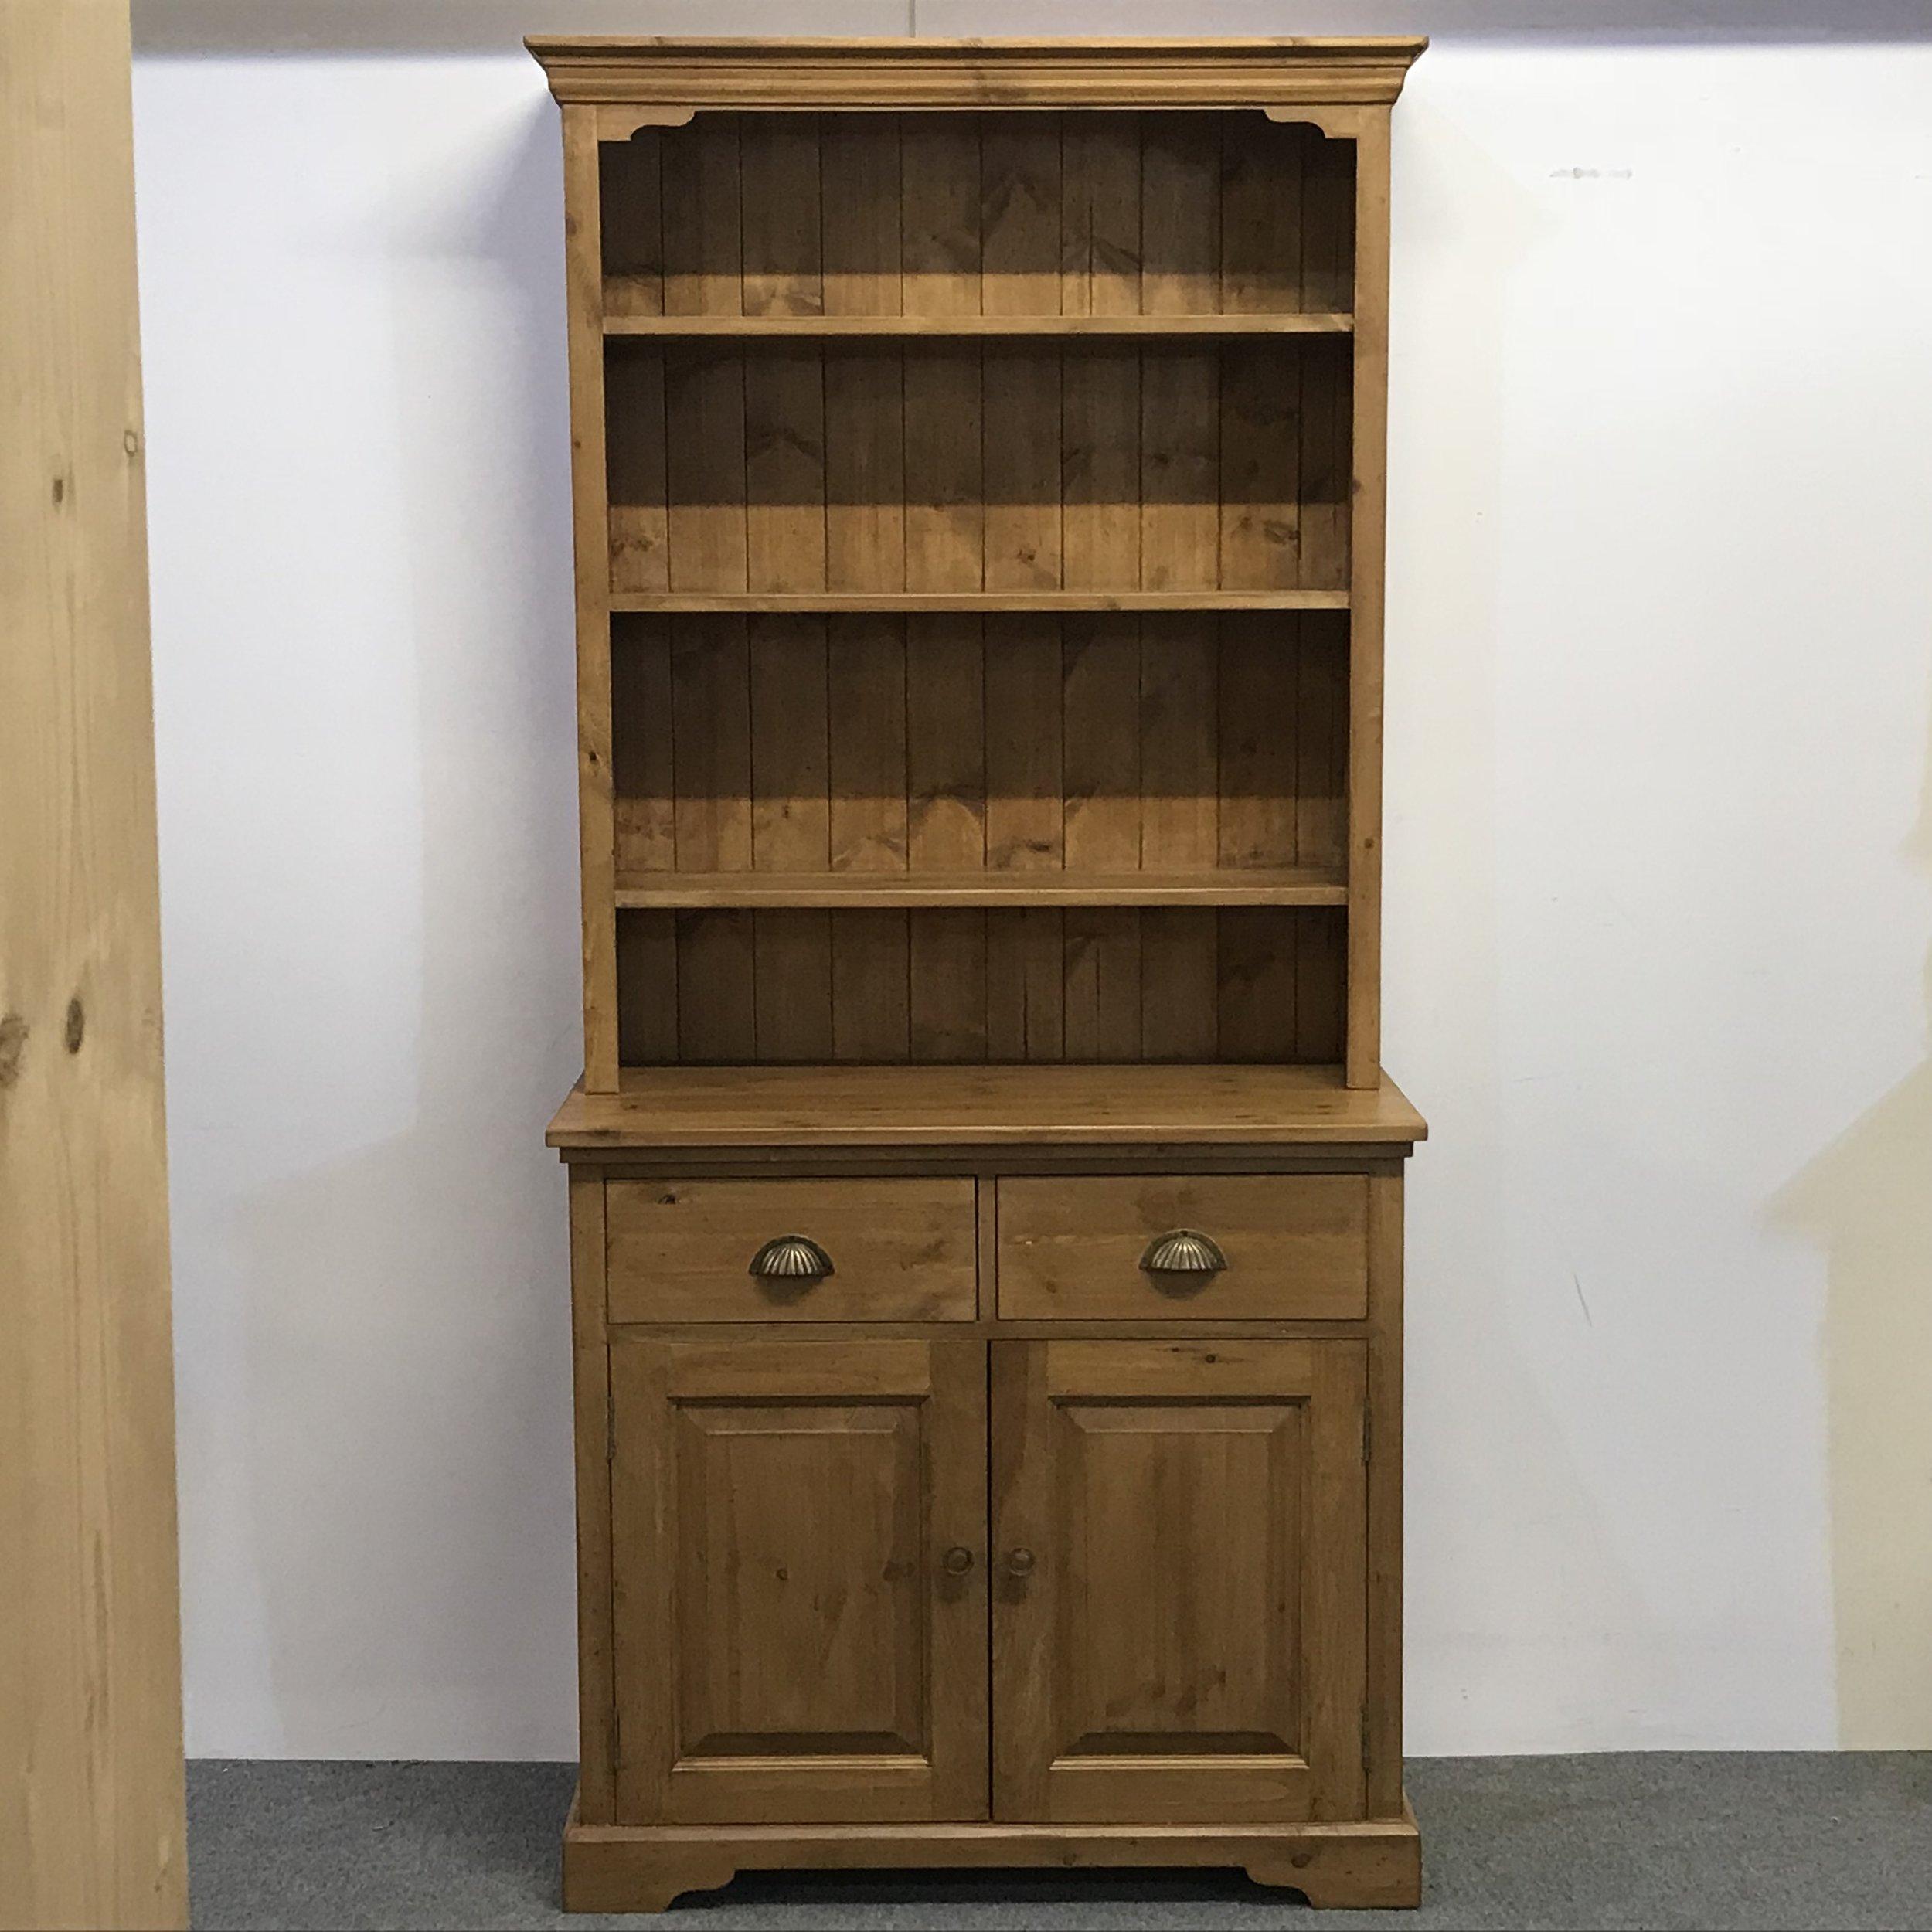 Made to measure 'new pine' dresser